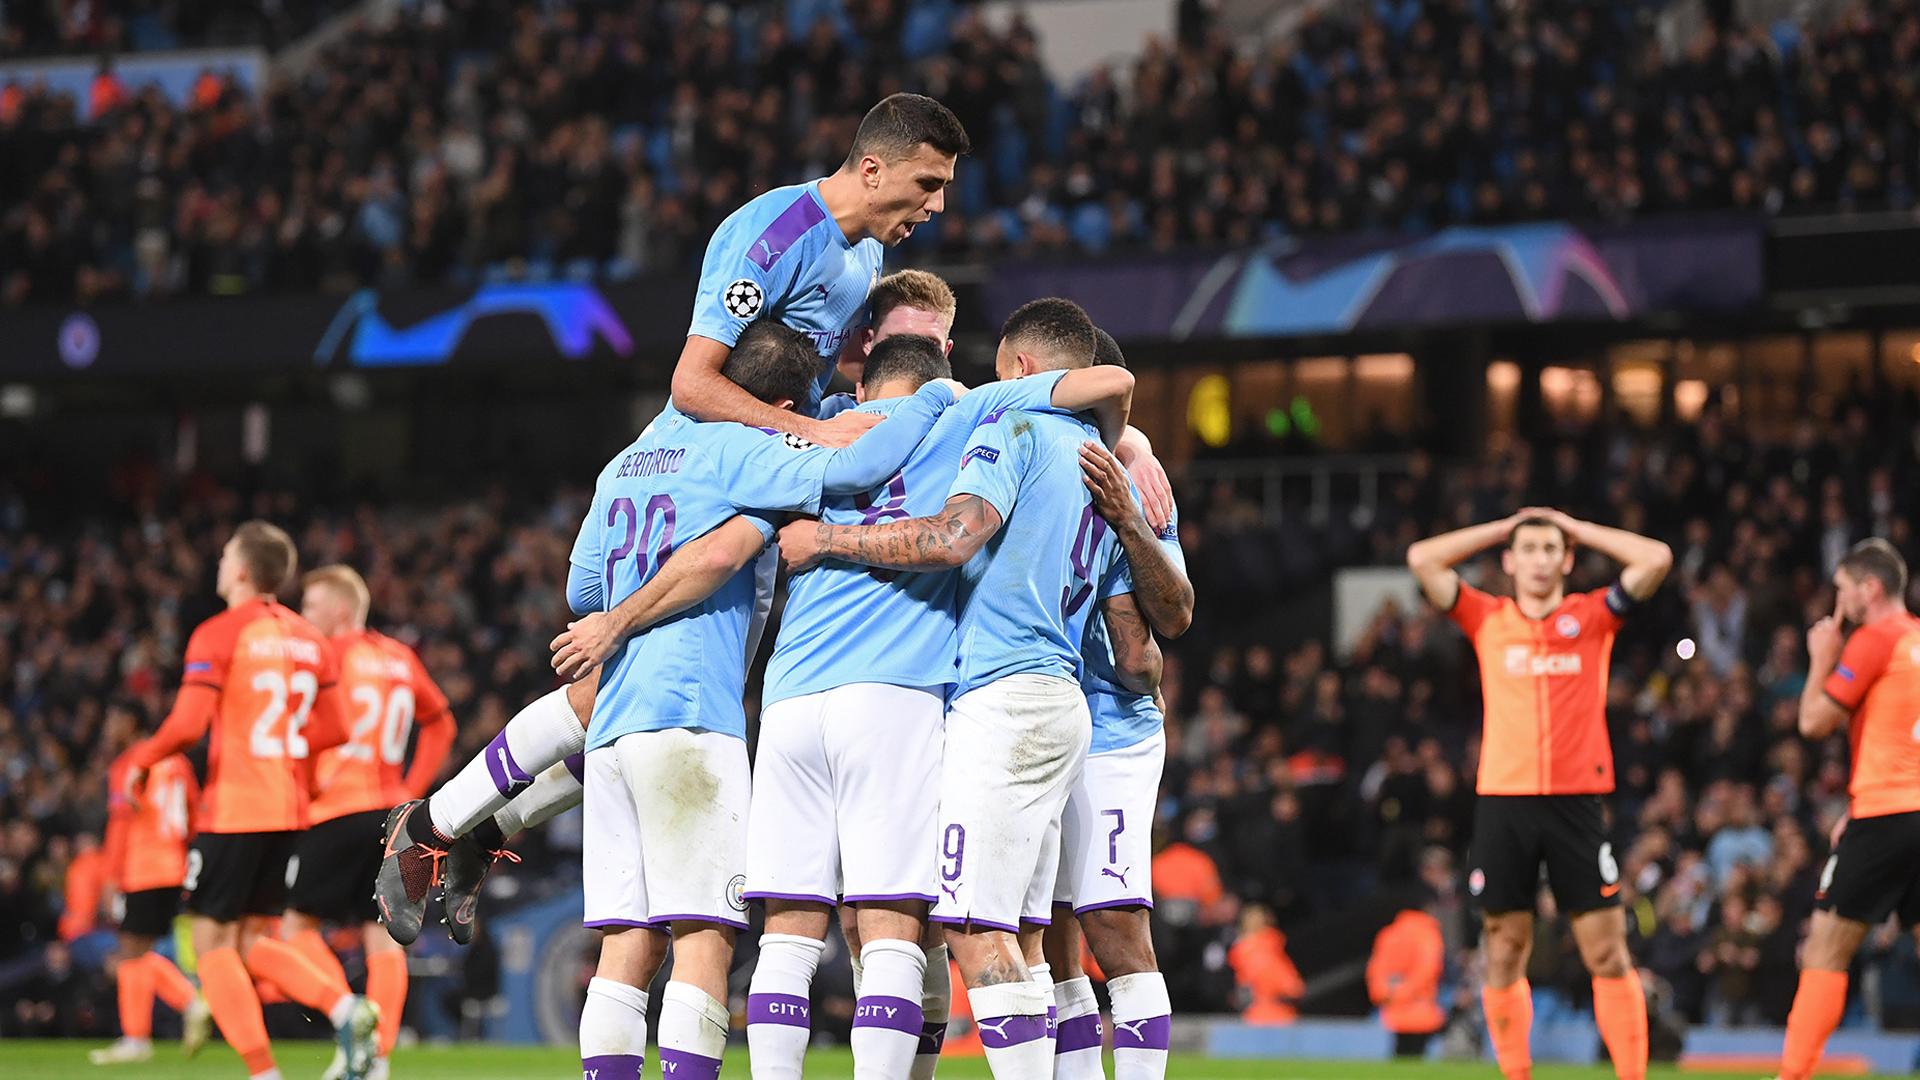 Manchester City Champions League 2019-20